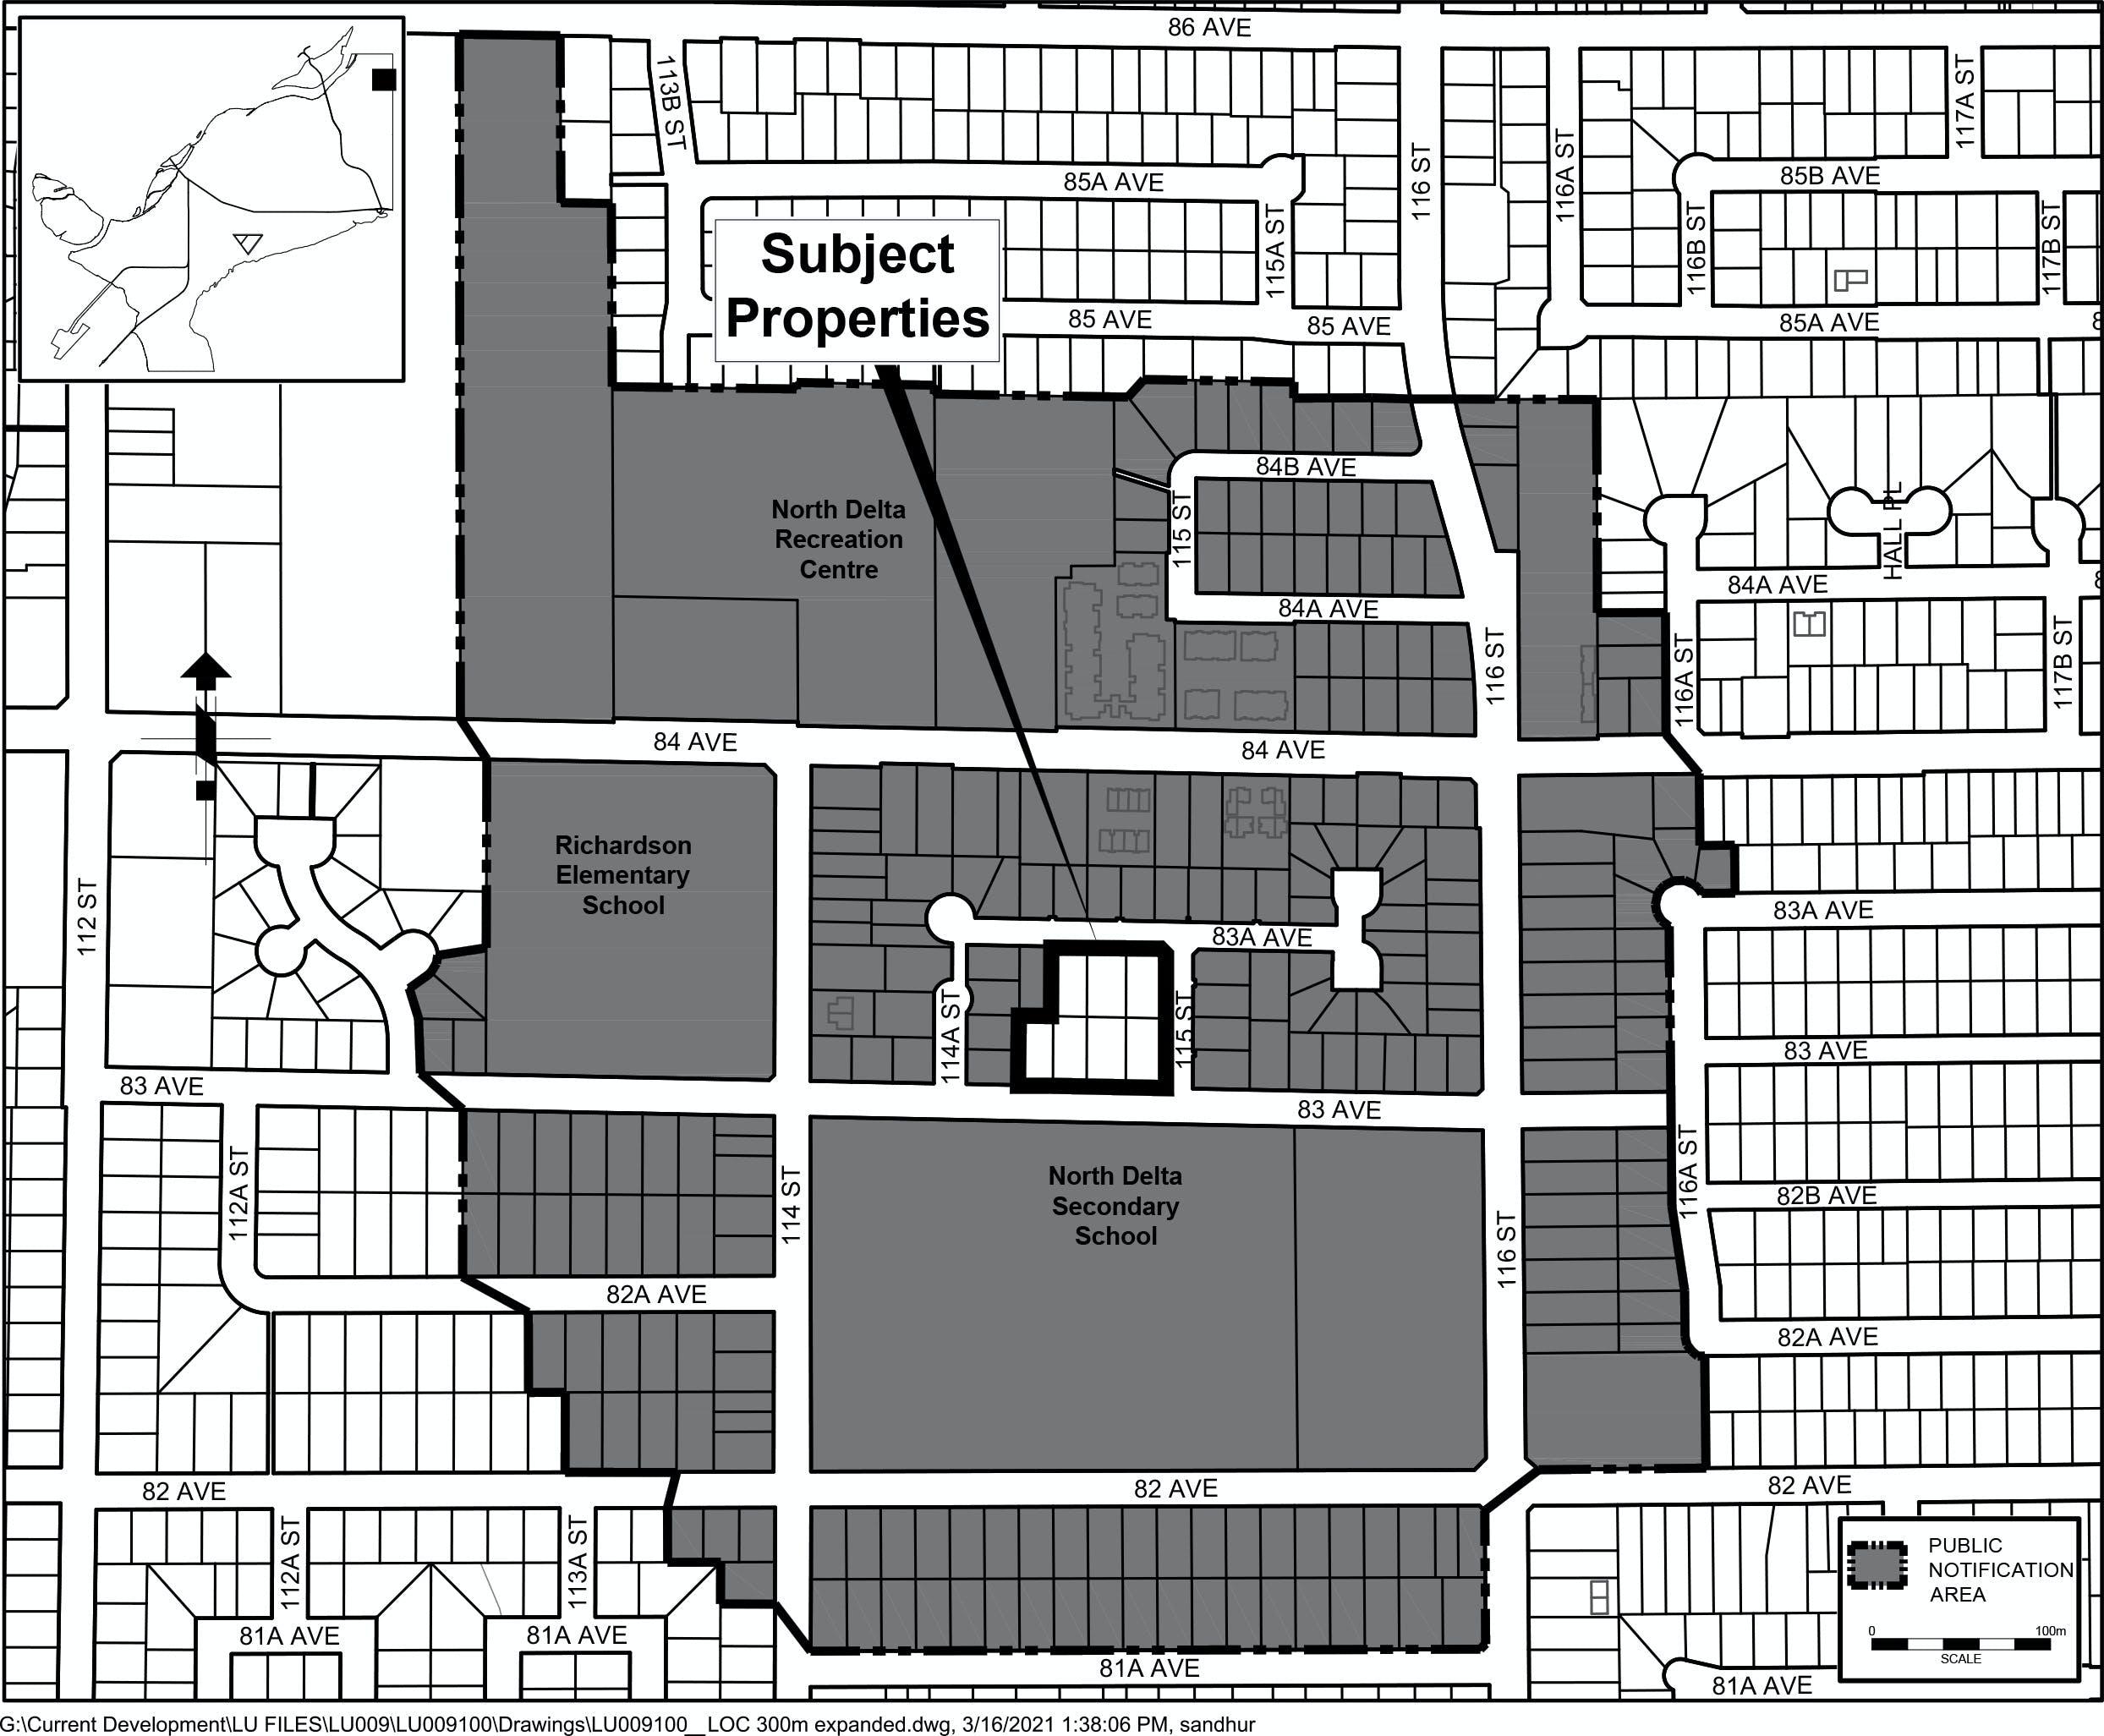 Location Map & Notification Area